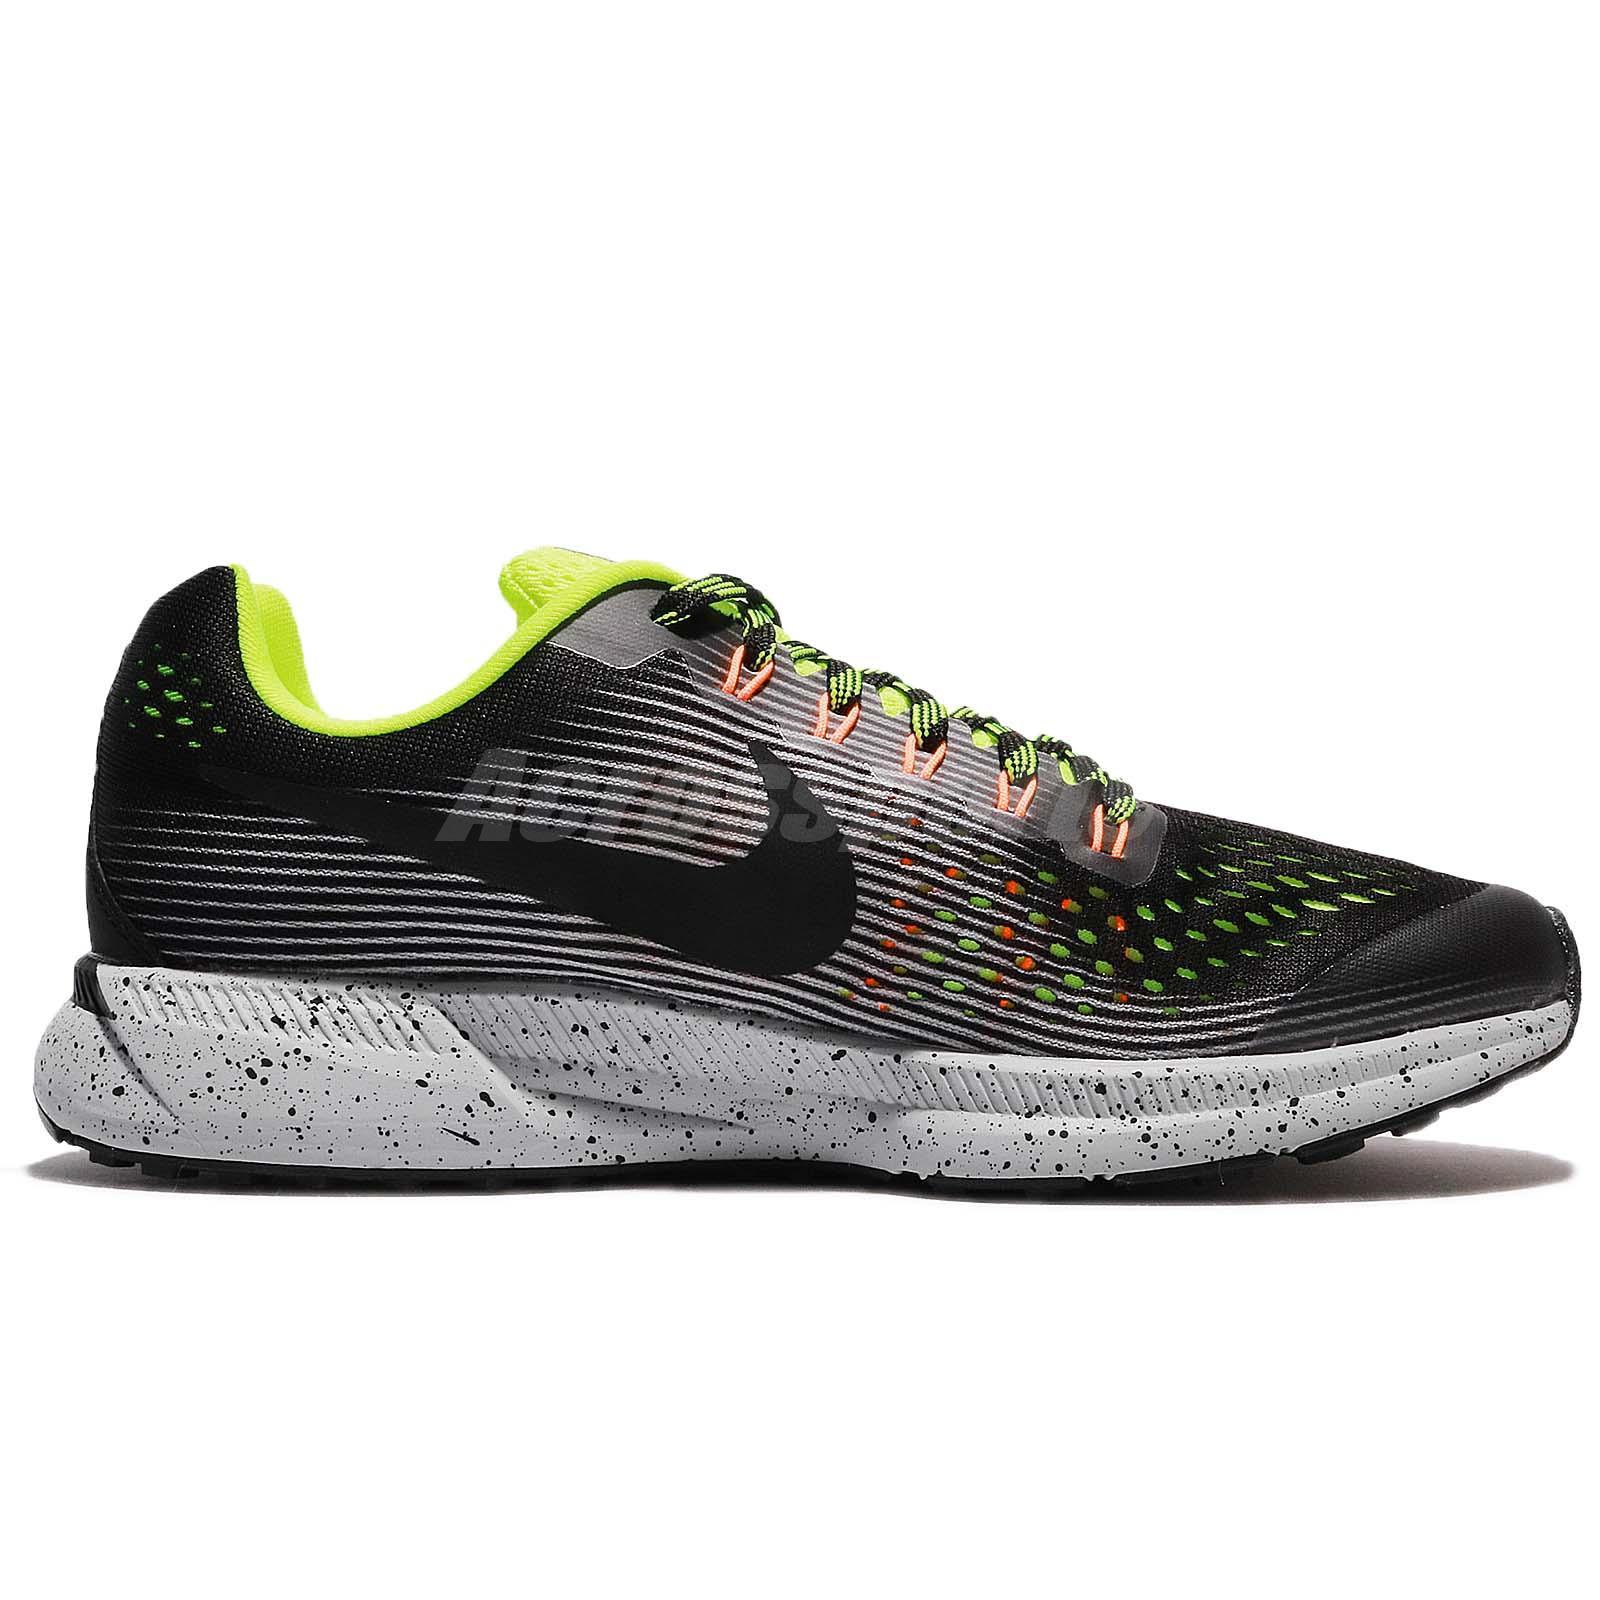 de5a16272a5c Nike Zoom Pegasus 34 Shield GS Water Repel Black Volt Kids Running ...